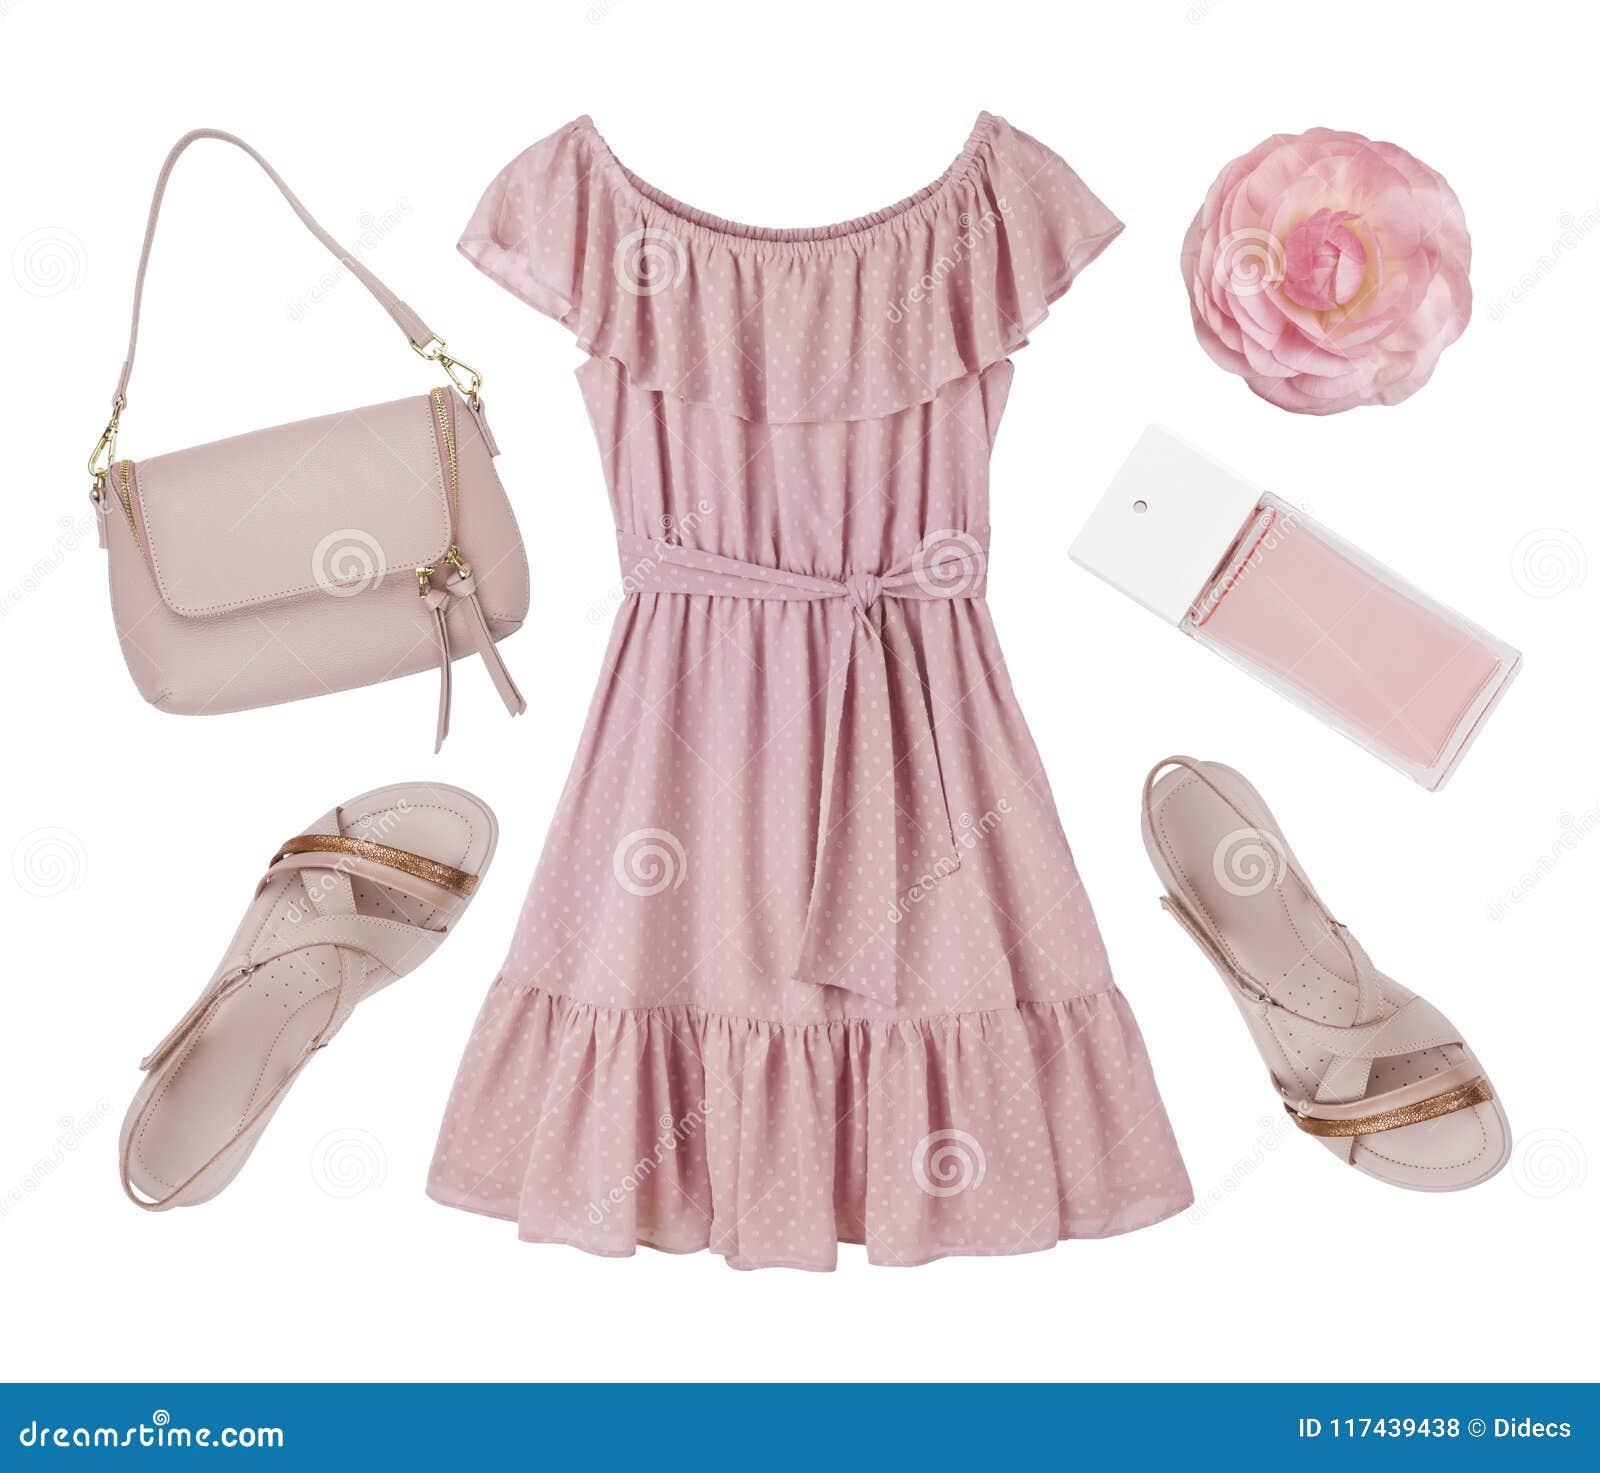 e96259e0e57 Ρόδινο φορεμάτων, παπουτσιών και εξαρτημάτων που απομονώνεται κολάζ ...